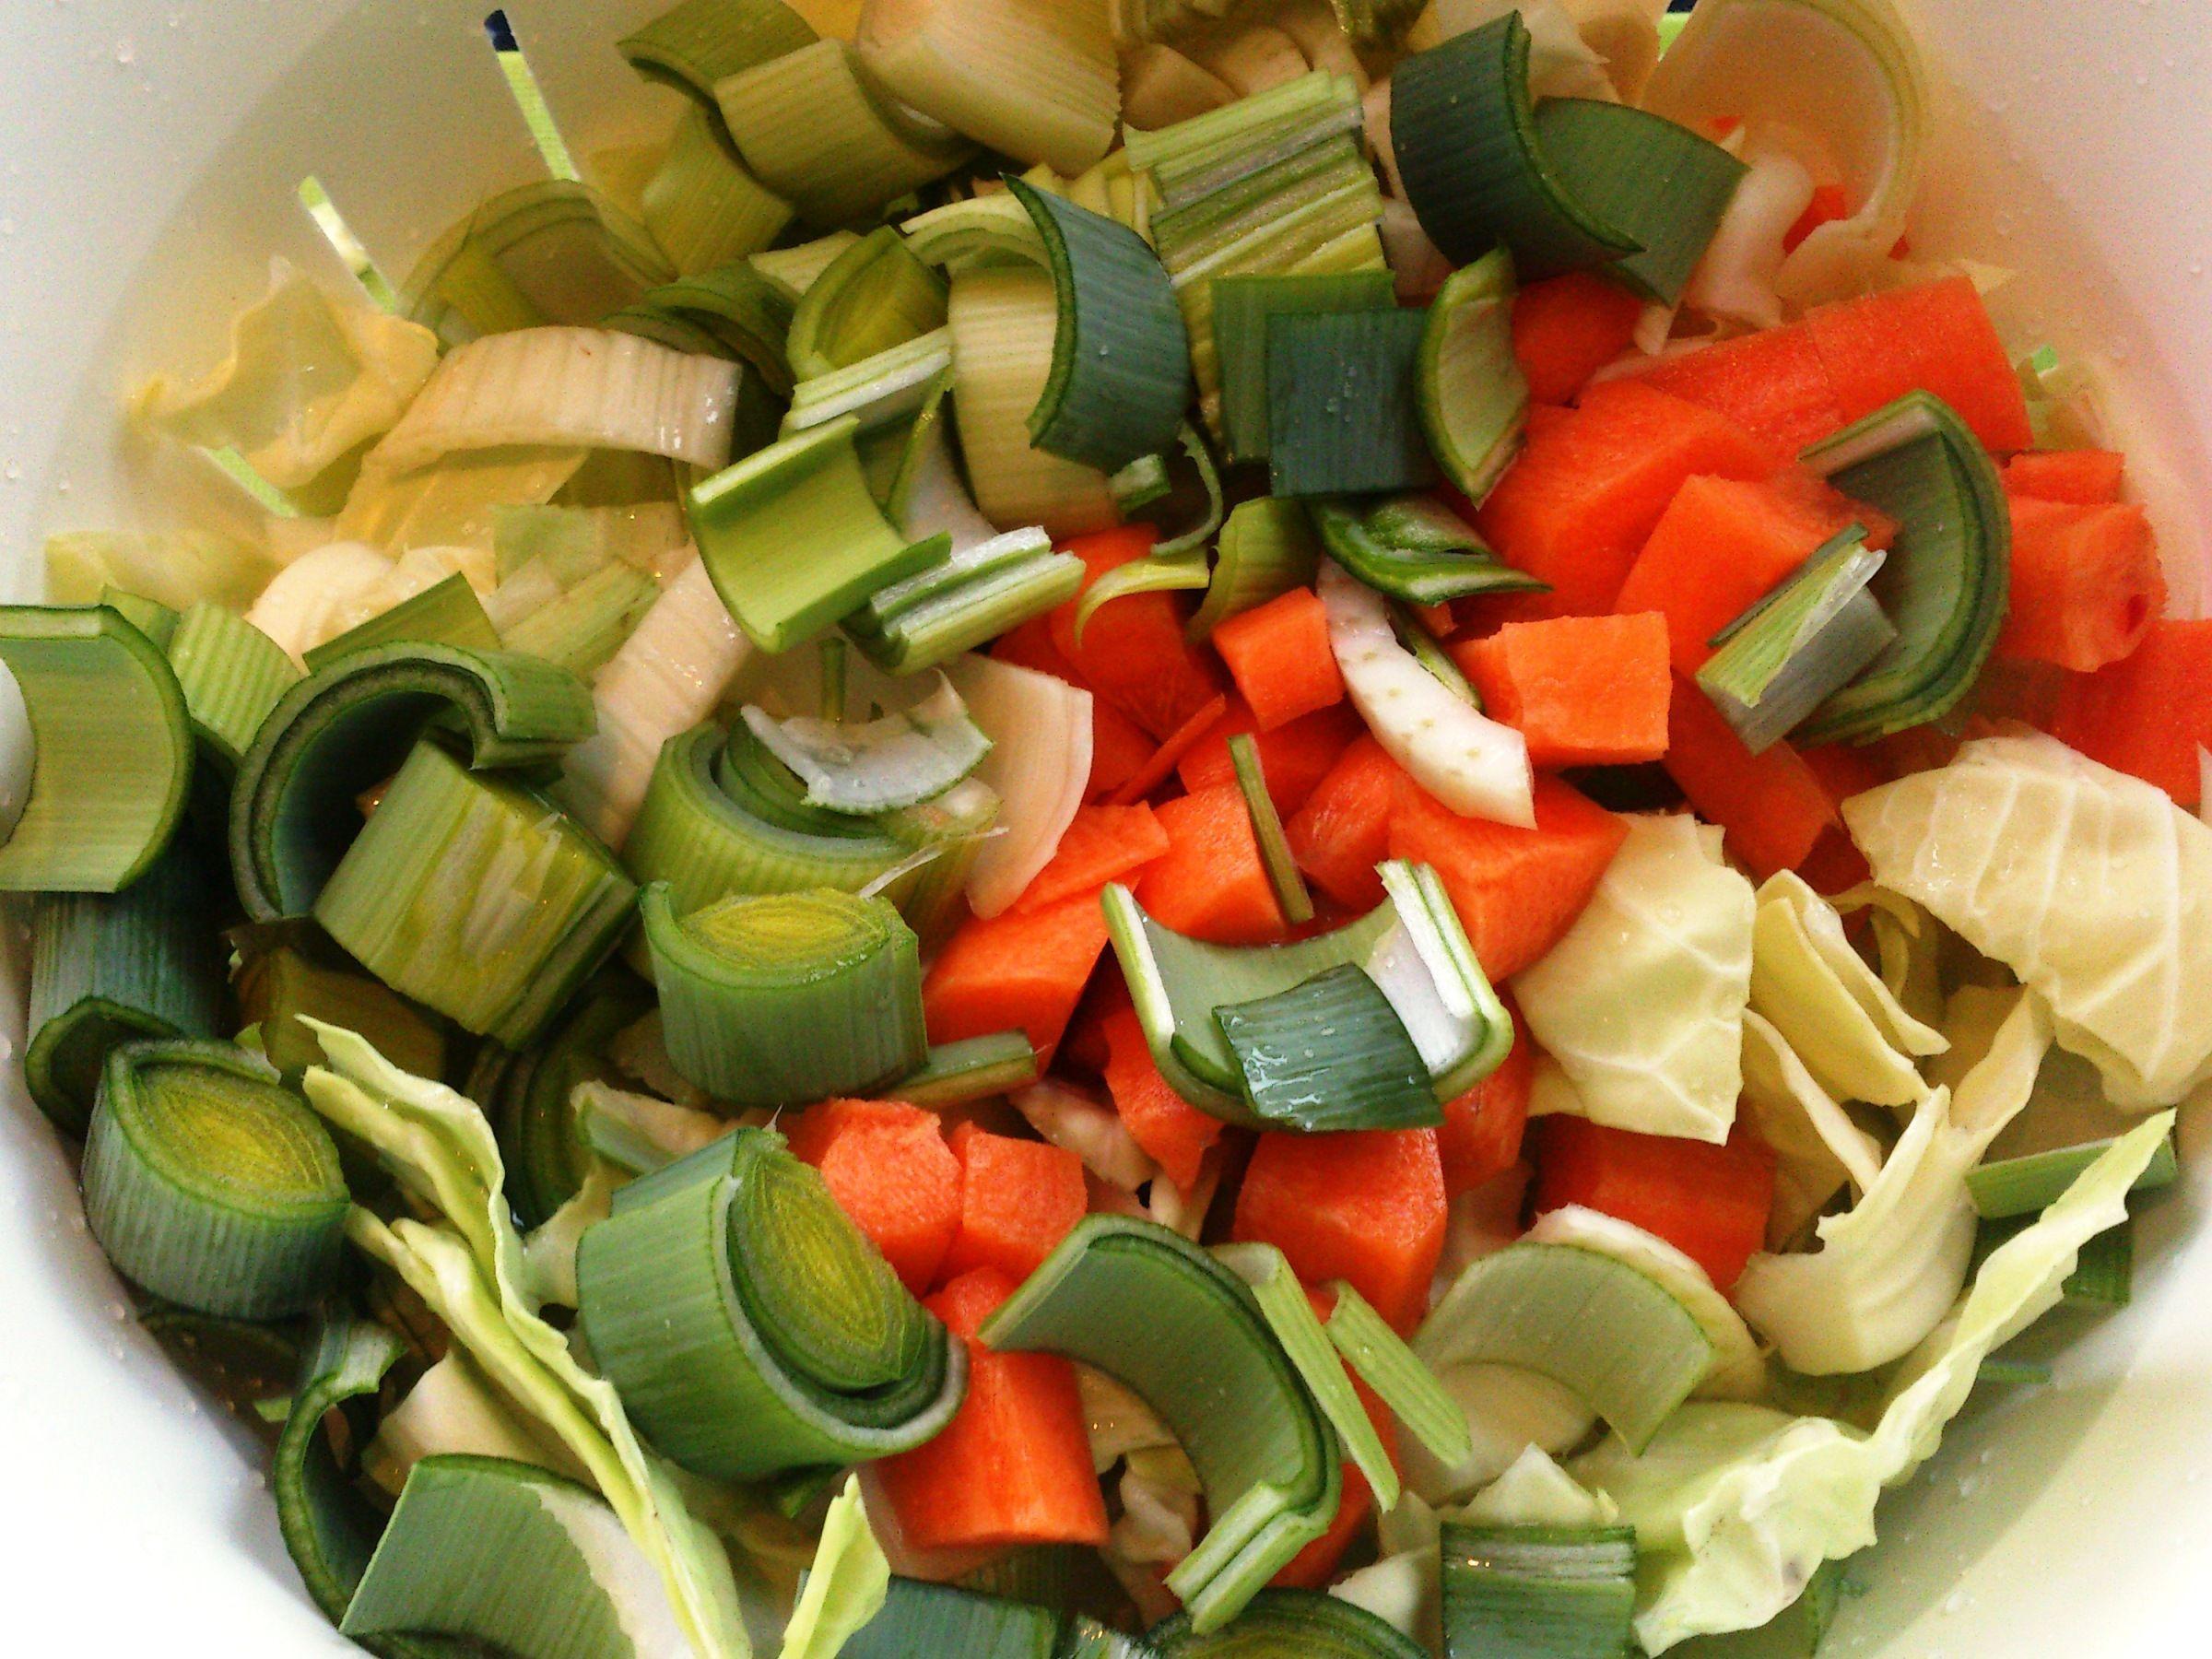 Grøntsagsfond hjemmelavet Grøntsagsfond hjemmelavet Grøntsagsfond bruges til at forstærke smagen i saucer og gryderetter Du kan fryse fonden ne...